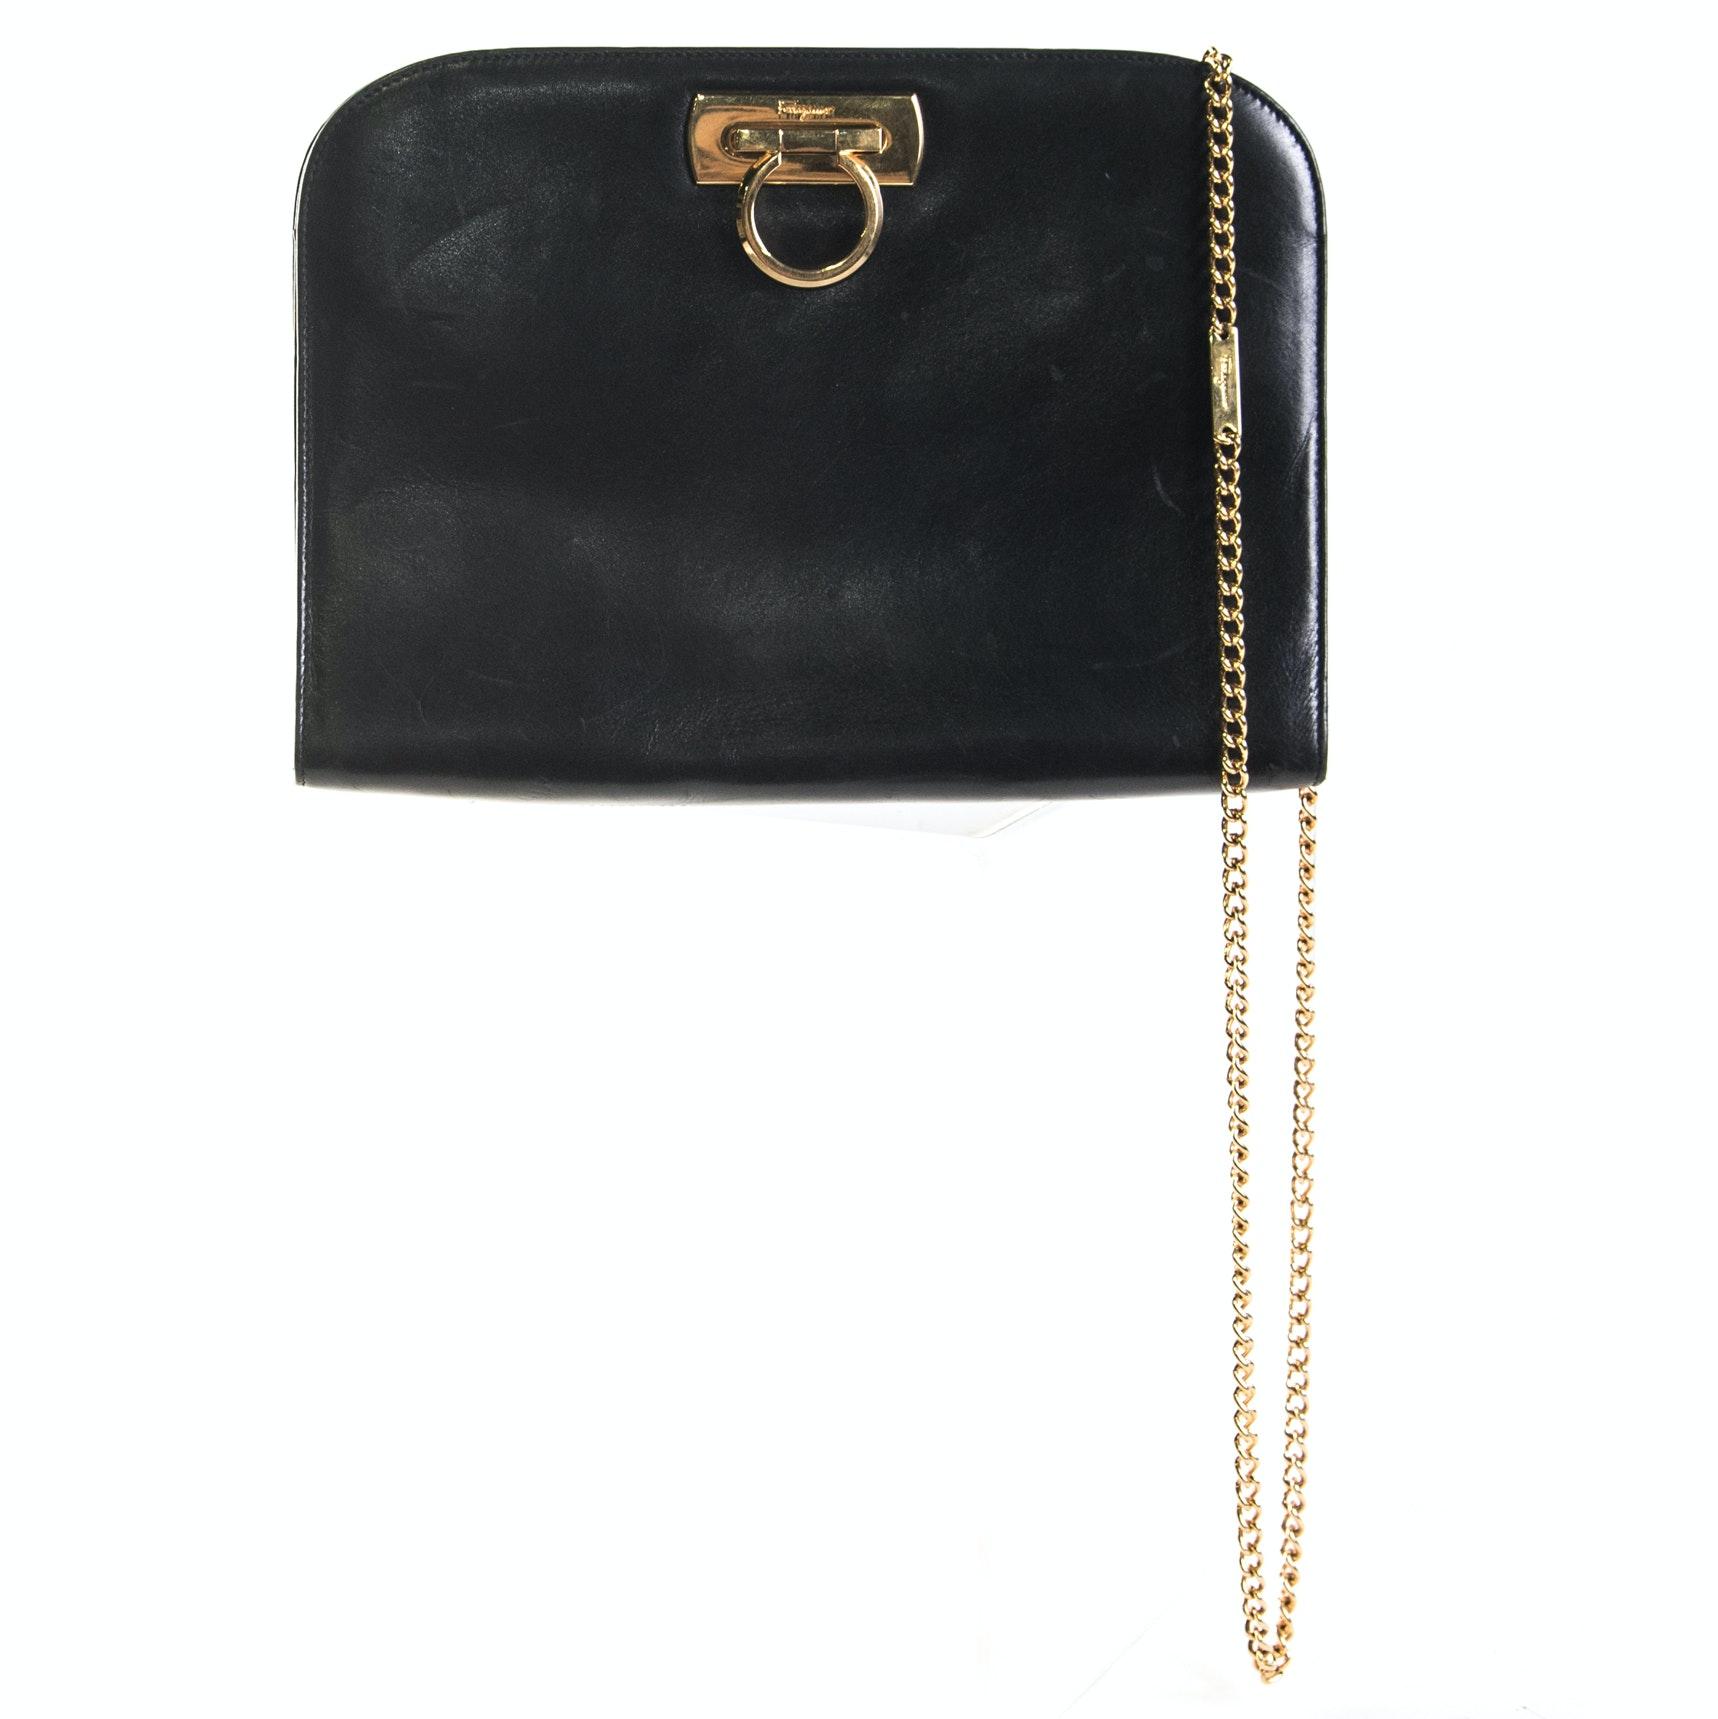 Salvatore Ferragamo Black Calfskin Leather Handbag